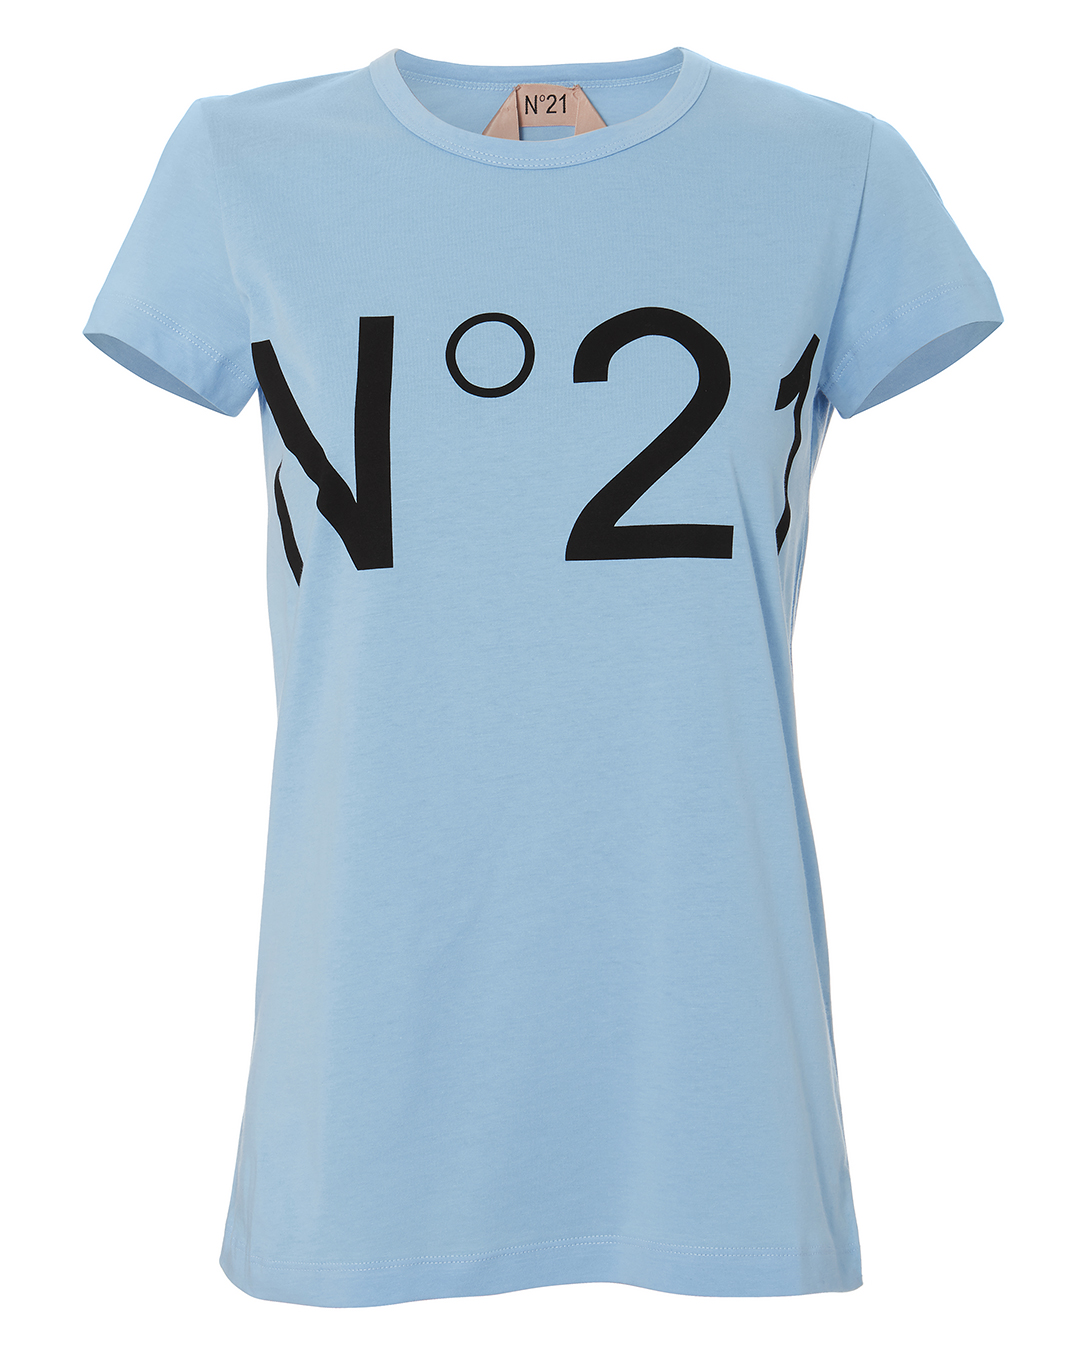 NO. 21 LOGO TEE BLUE-LT